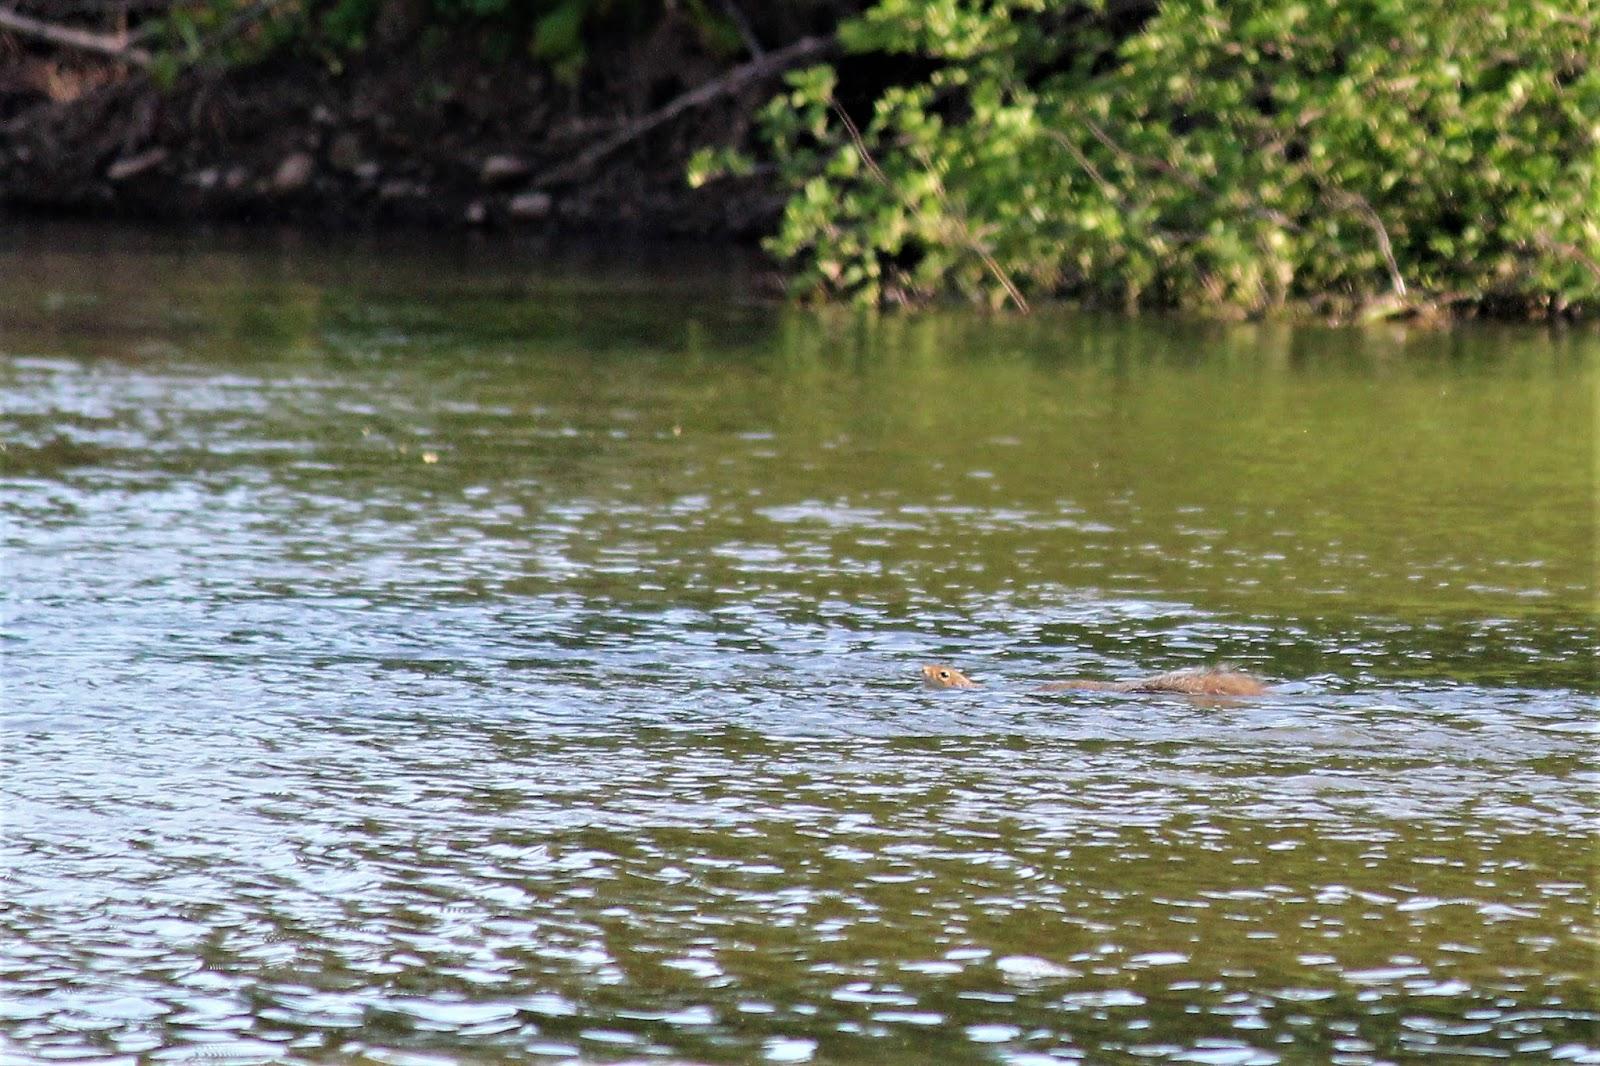 Wny fly fishing wny fly fishing stream report 6 10 2017 for Fly fishing blog